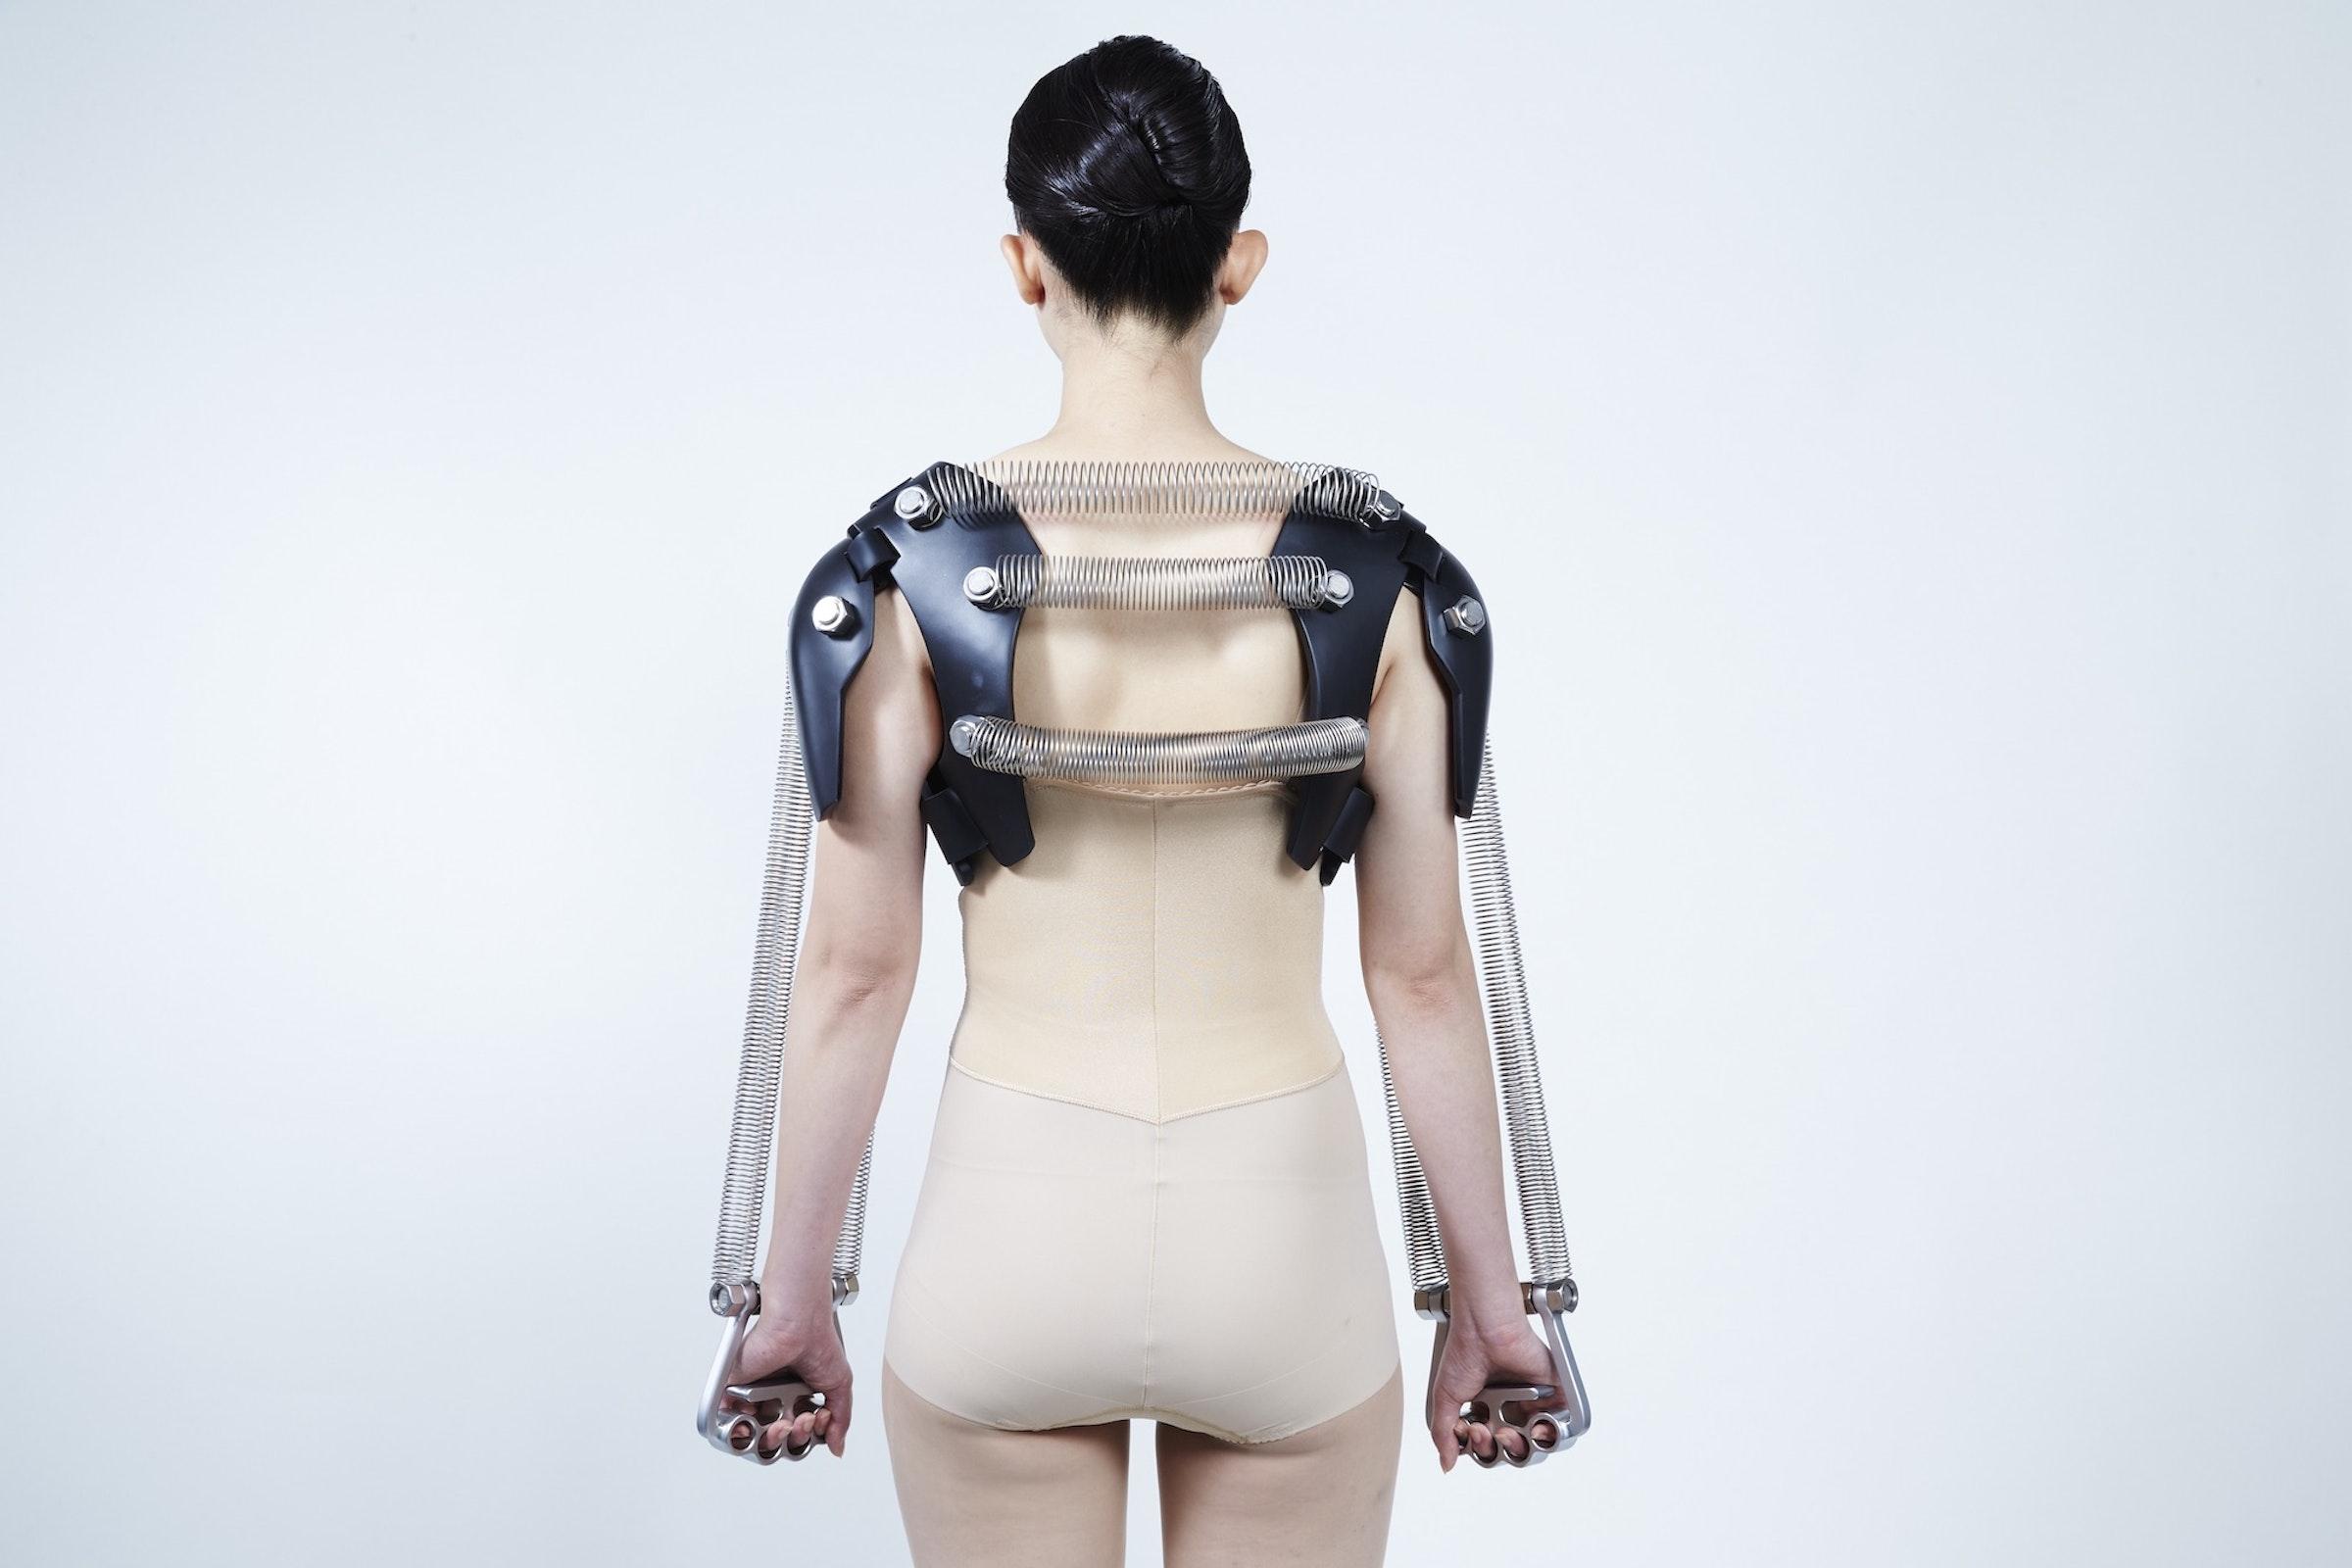 Plaster cast to prevent bad, slumped posture & Plaster cast to build arm muscles.